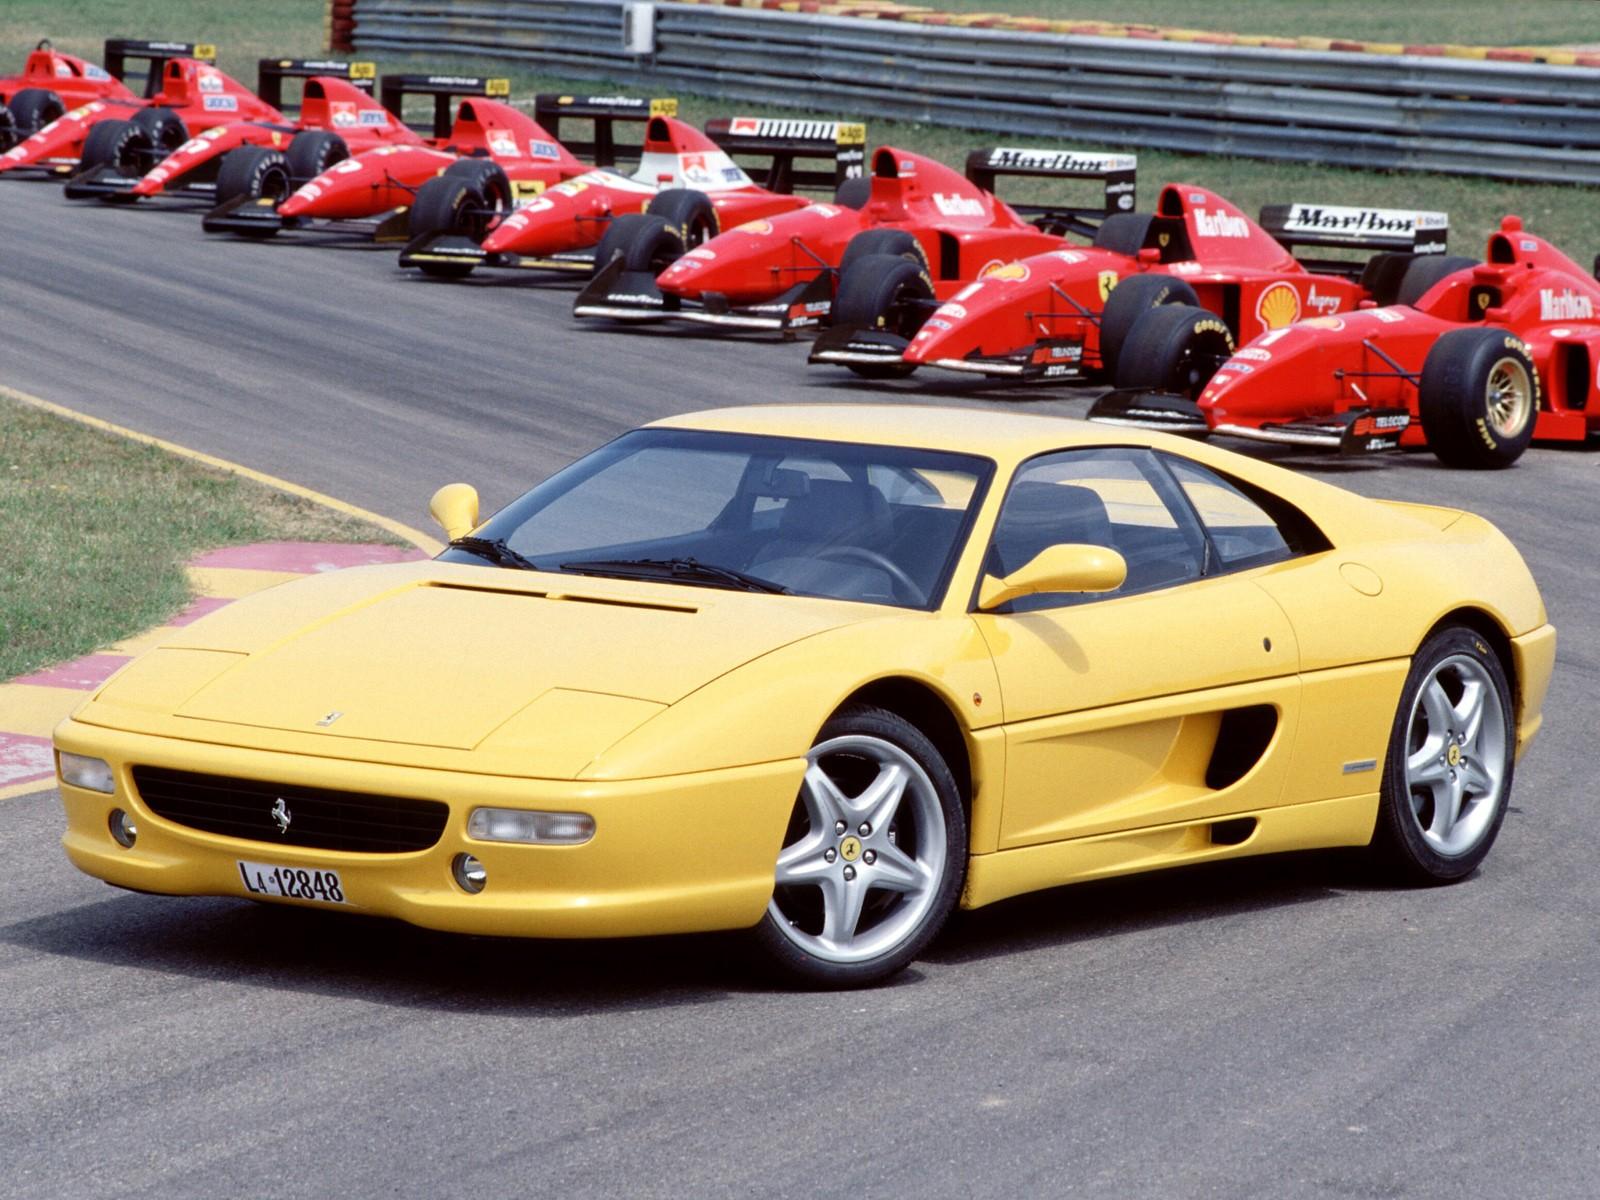 Ferrari F355 Specs 1994 1995 1996 1997 1998 1999